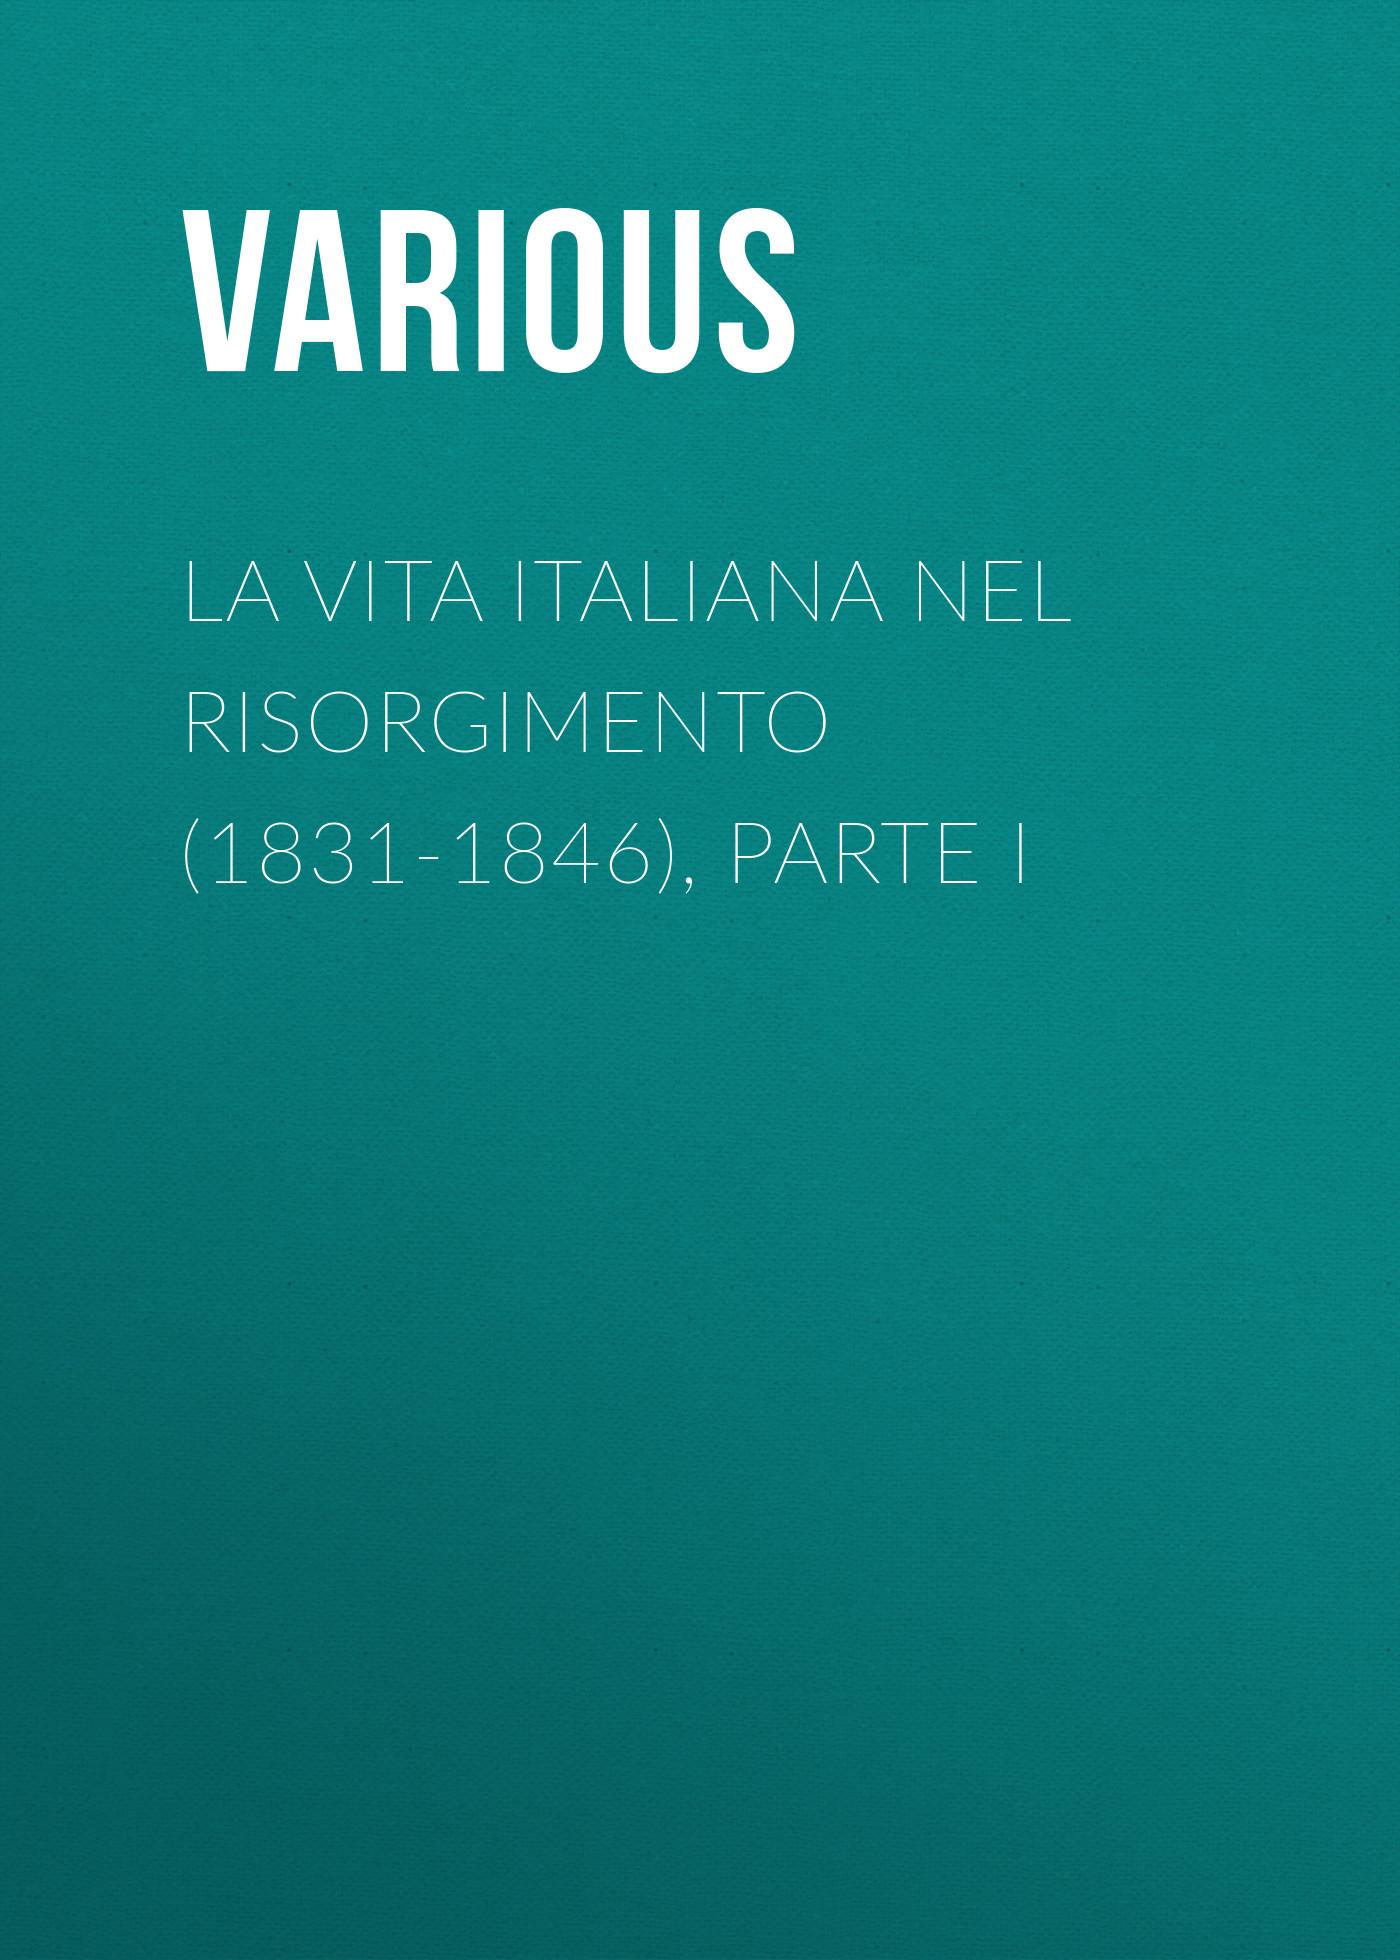 Various La vita Italiana nel Risorgimento (1831-1846), parte I bersezio vittorio la plebe parte i